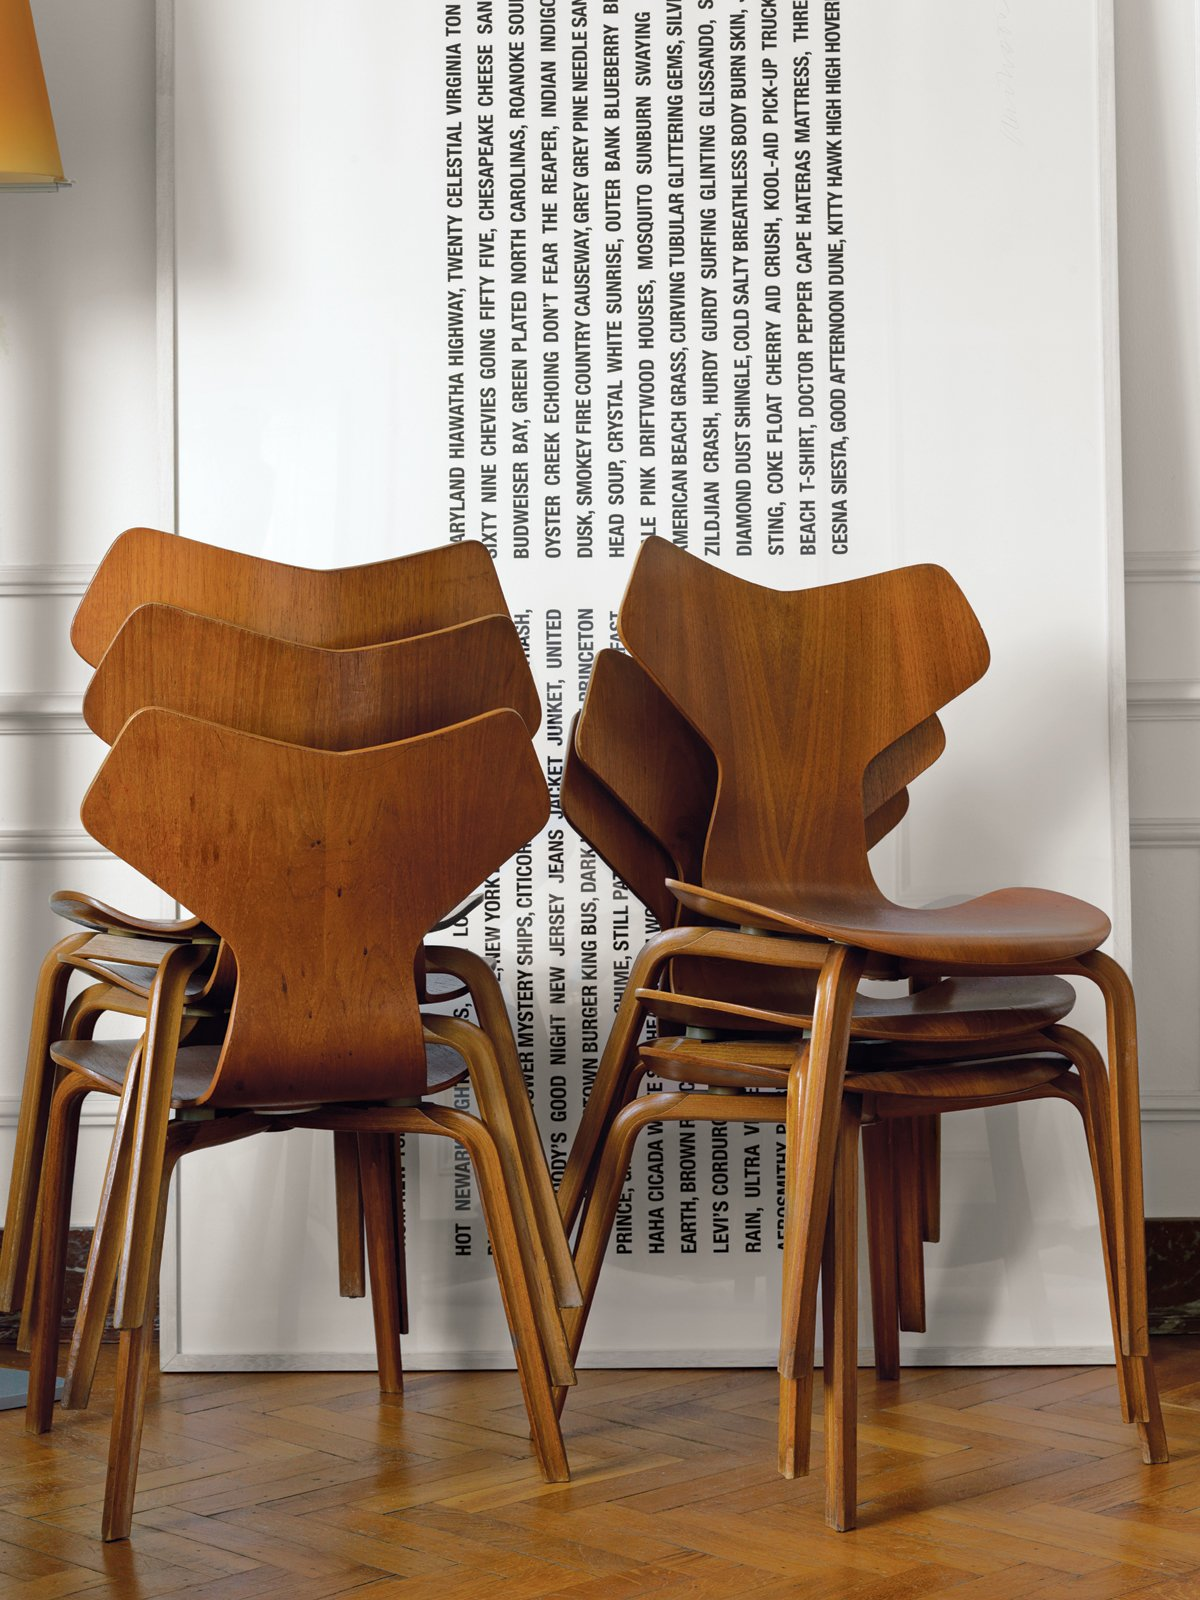 #seatingdesign #chair #stacked #GrandPrix #ArneJacobsen #minimal #midcenturymodern #modern #wood #timeless   100+ Best Modern Seating Designs